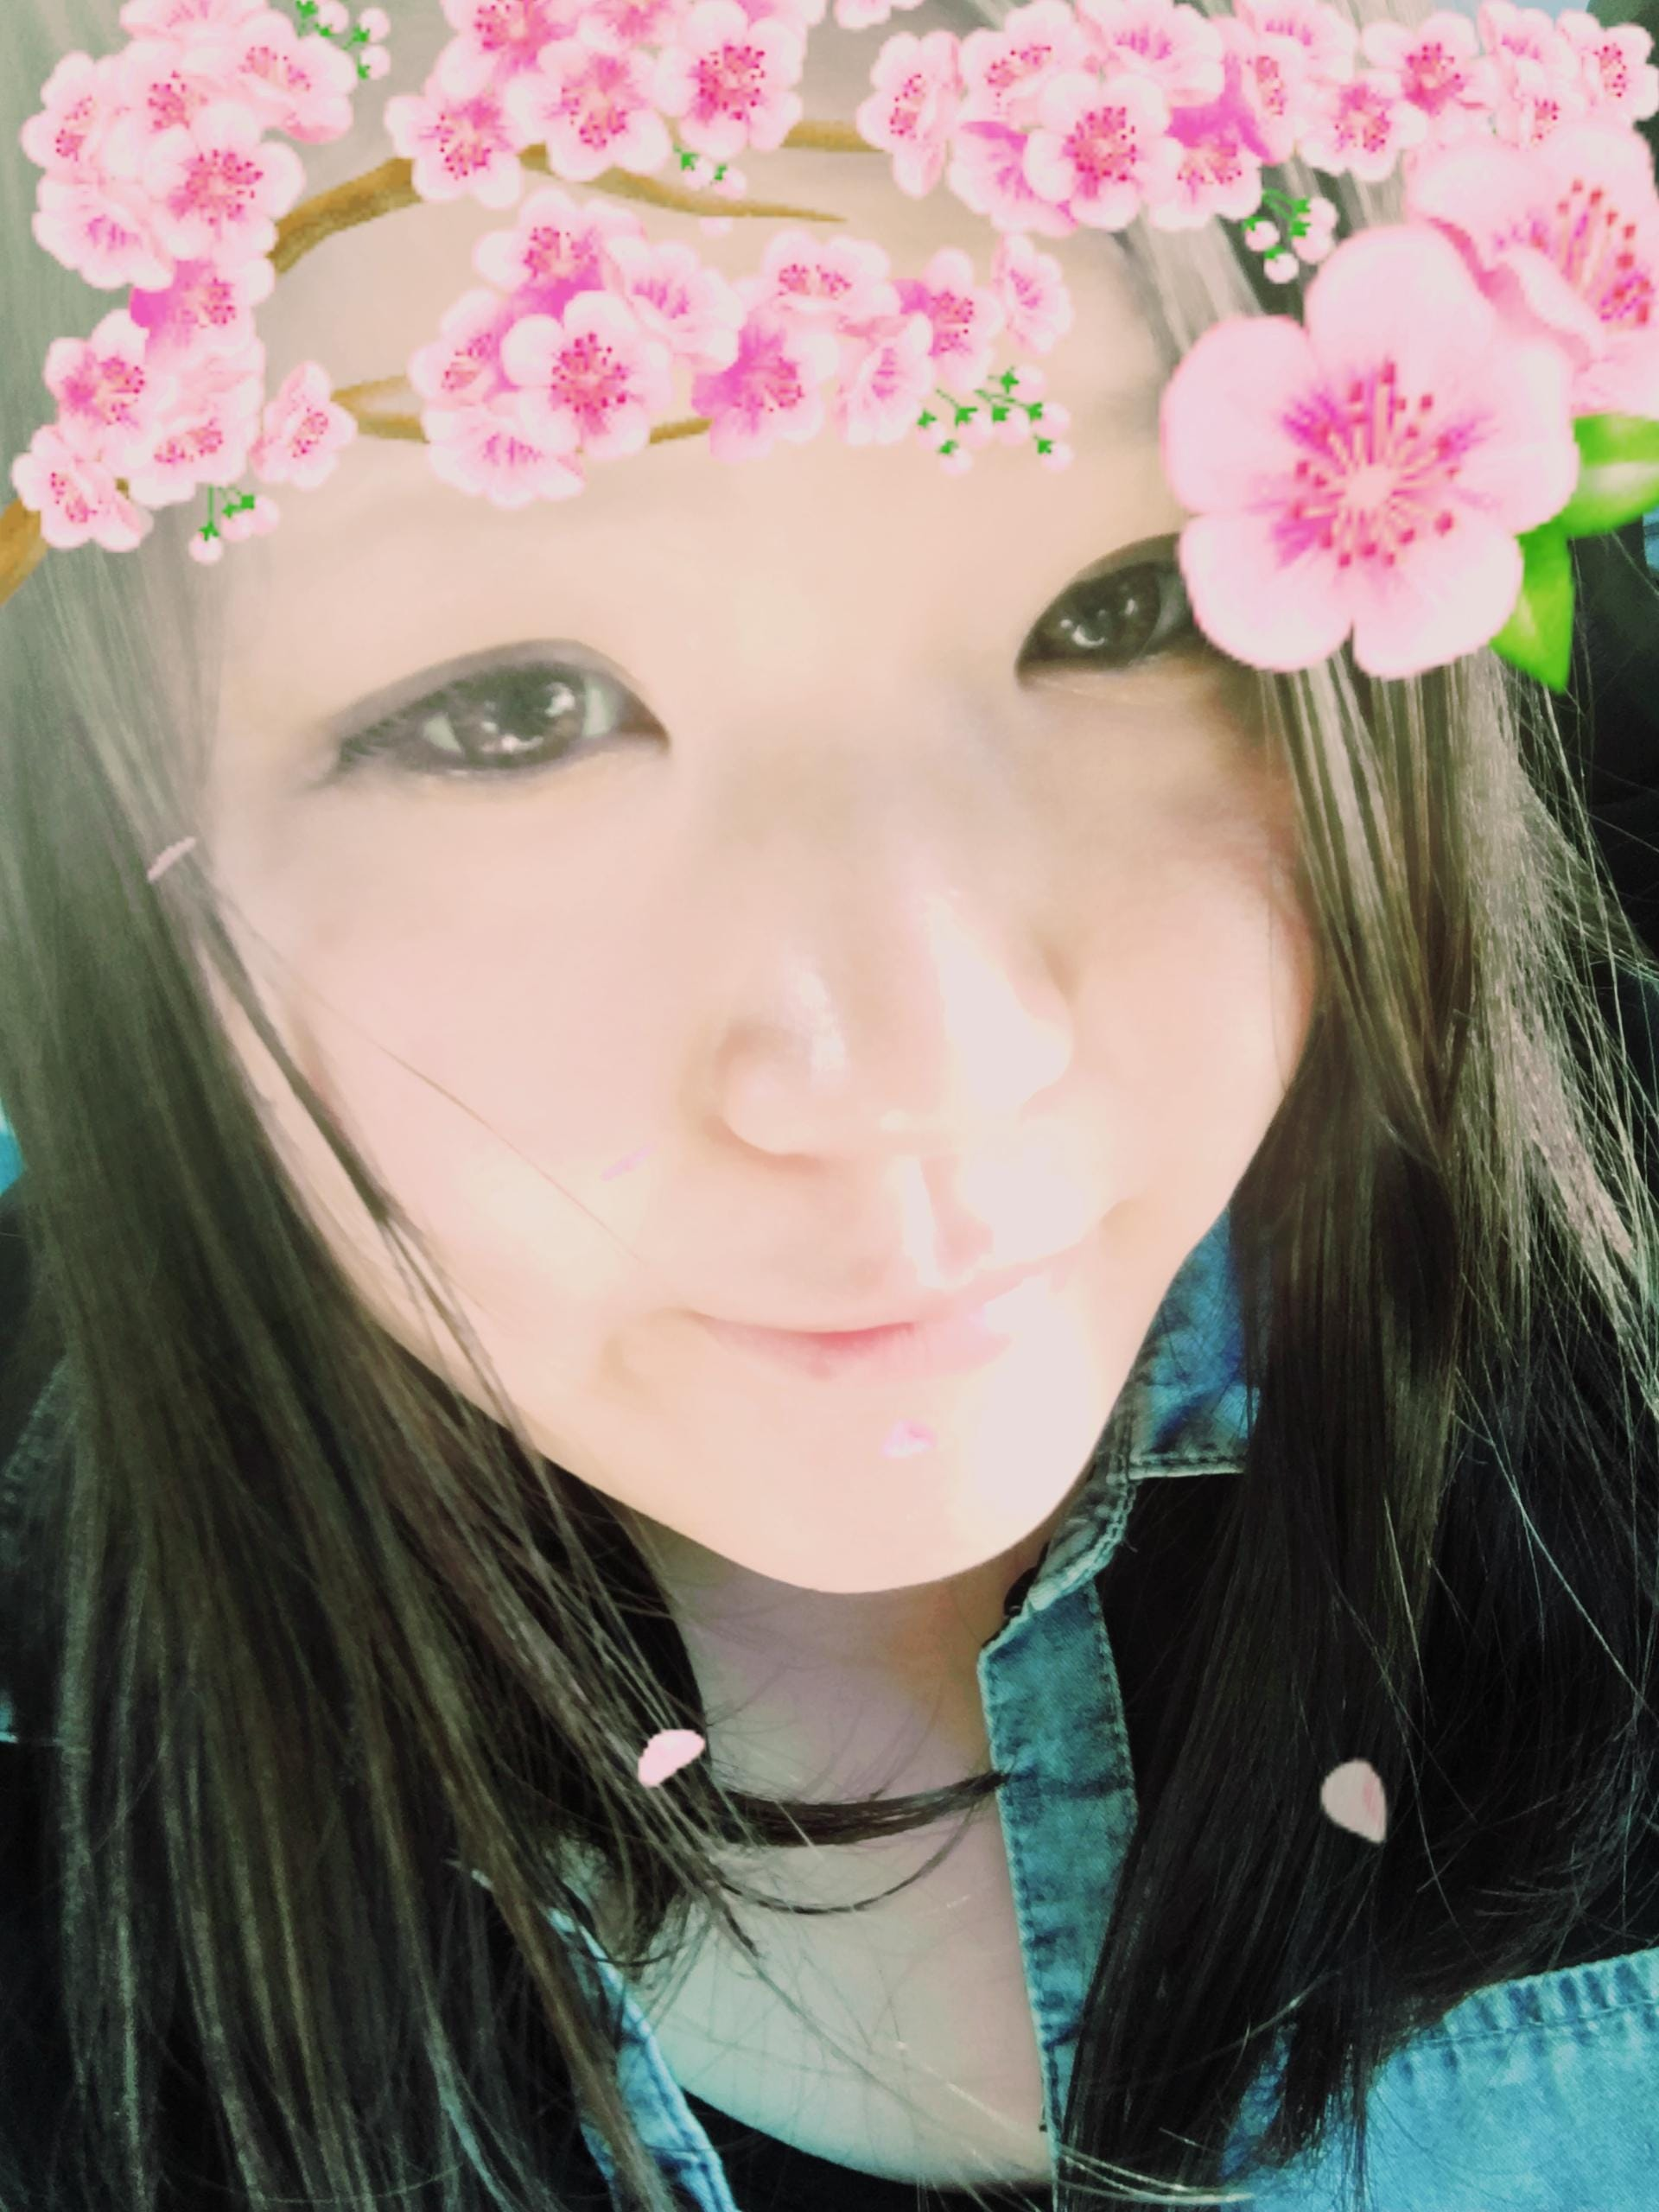 https://s3-ap-northeast-1.amazonaws.com/files.deli-fuzoku.jp/img/shop/snbcom/diary/3771173/d_0_20170914143123453.JPG